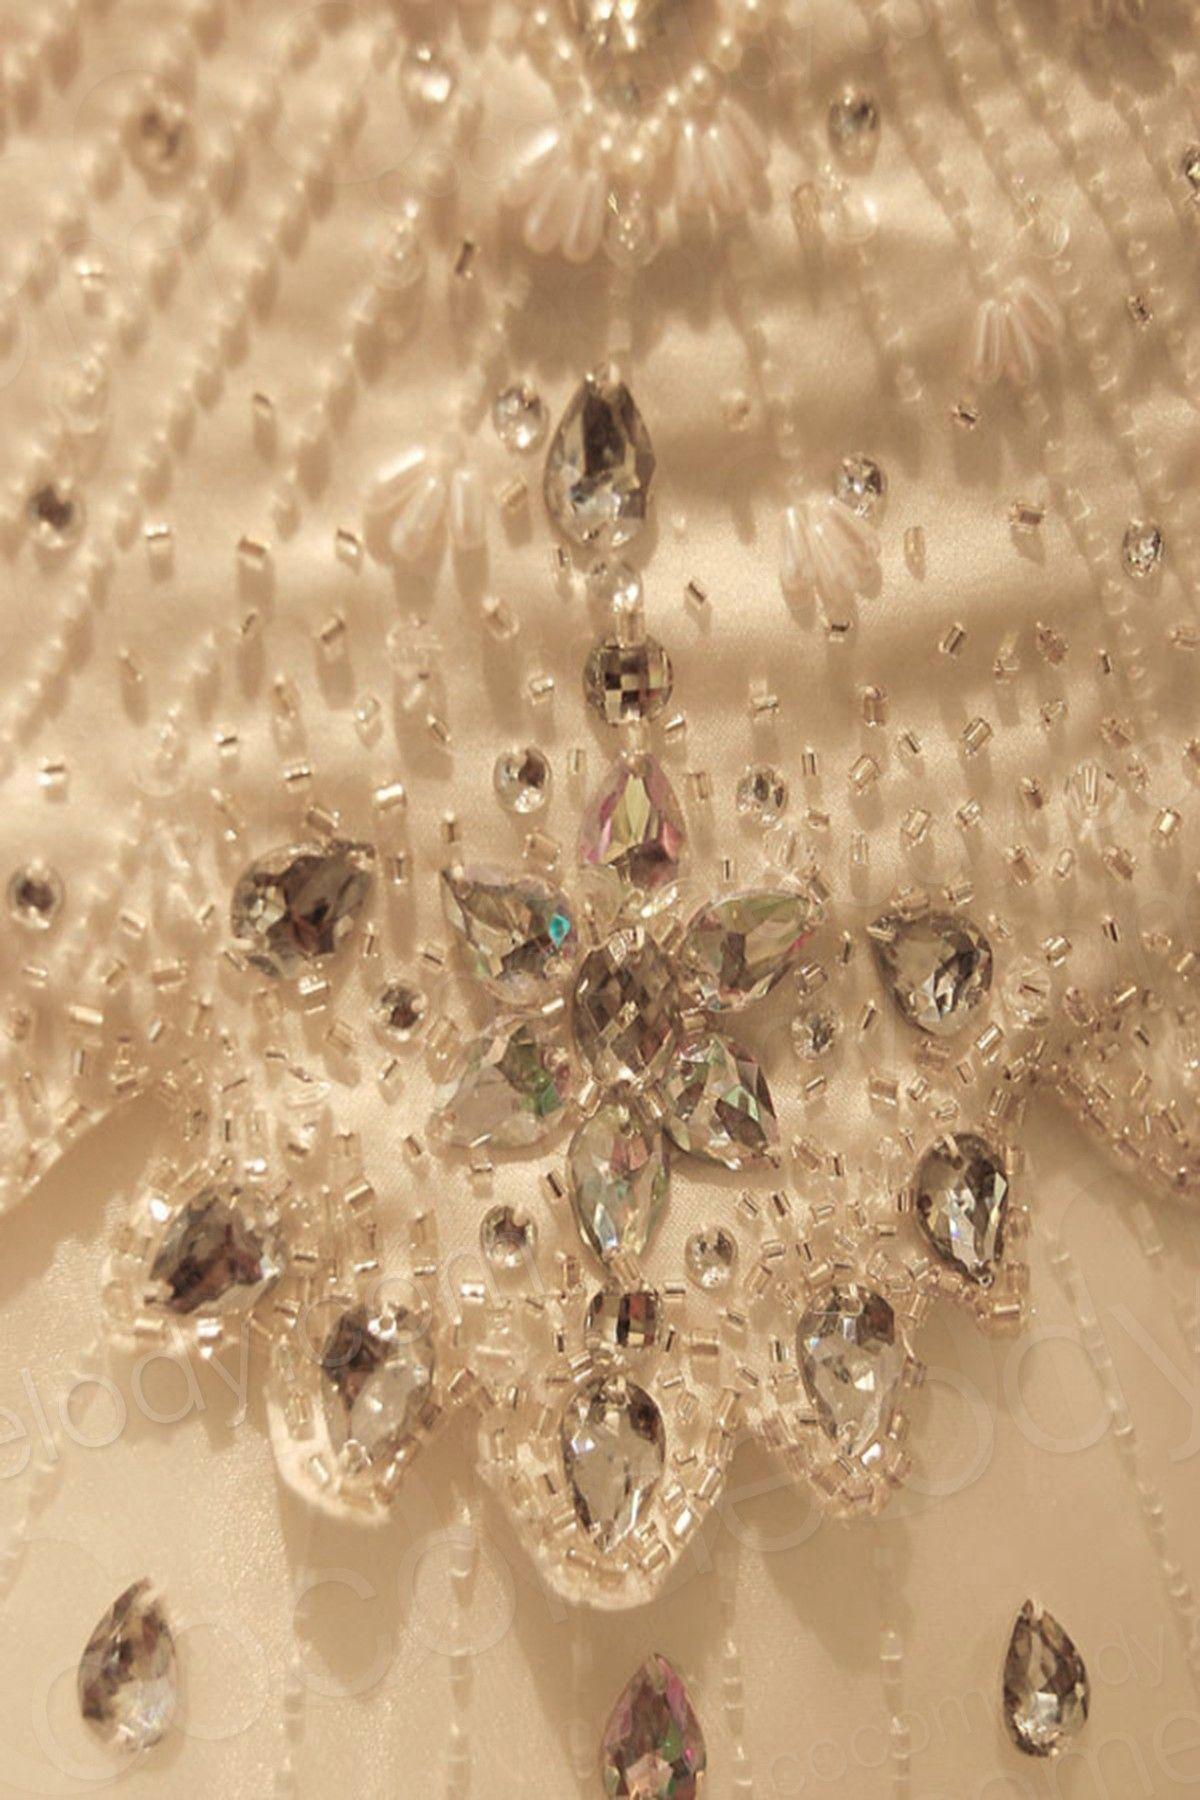 Gorgeous A-Line Spaghetti Strap Natural Chapel Train Organza Ivory Sleeveless Wedding Dress with Beading SW0009 #weddingdress #cocomelody